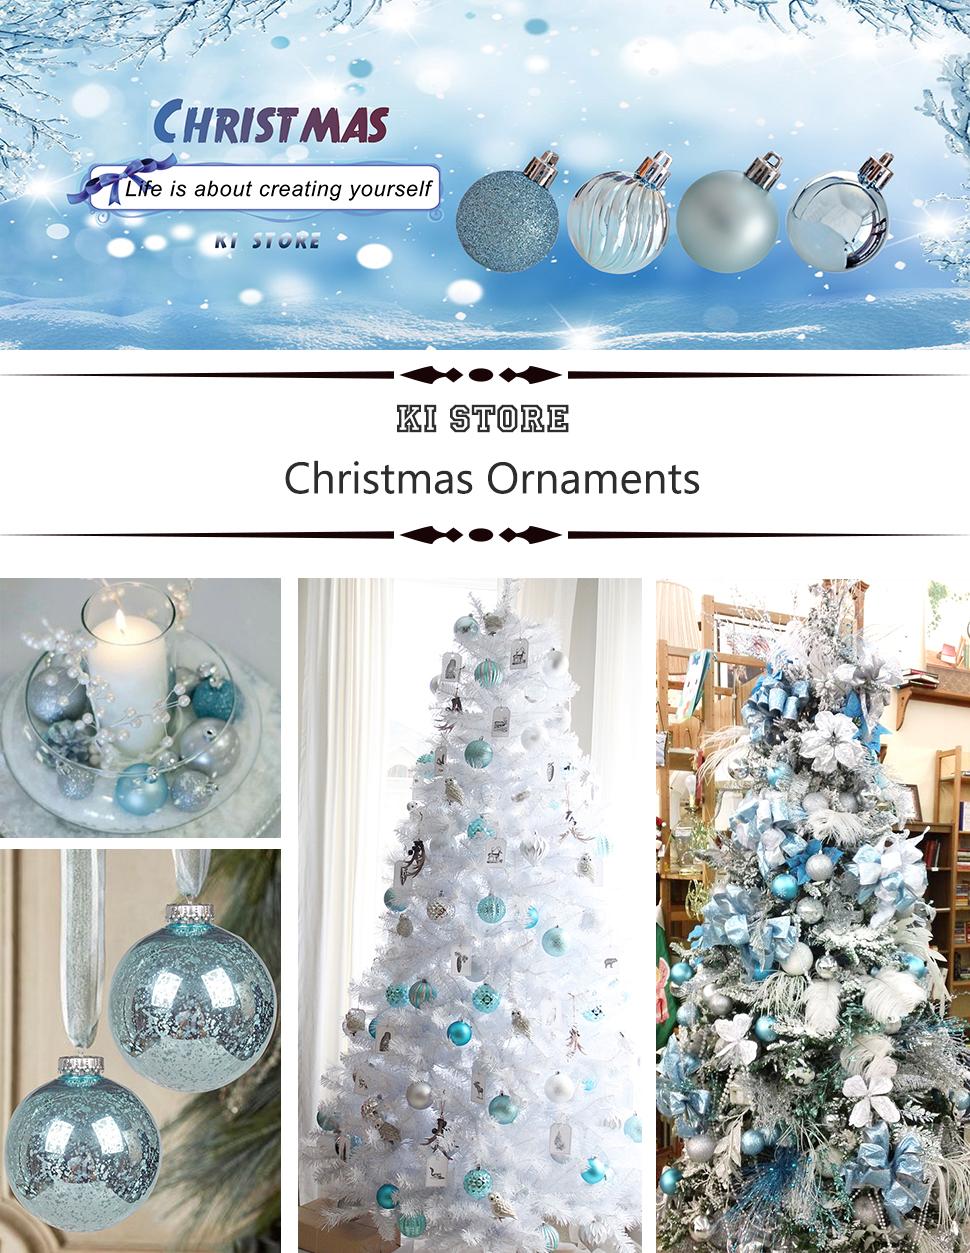 Amazon.com: KI Store 24ct Christmas Ball Ornaments Shatterproof ...